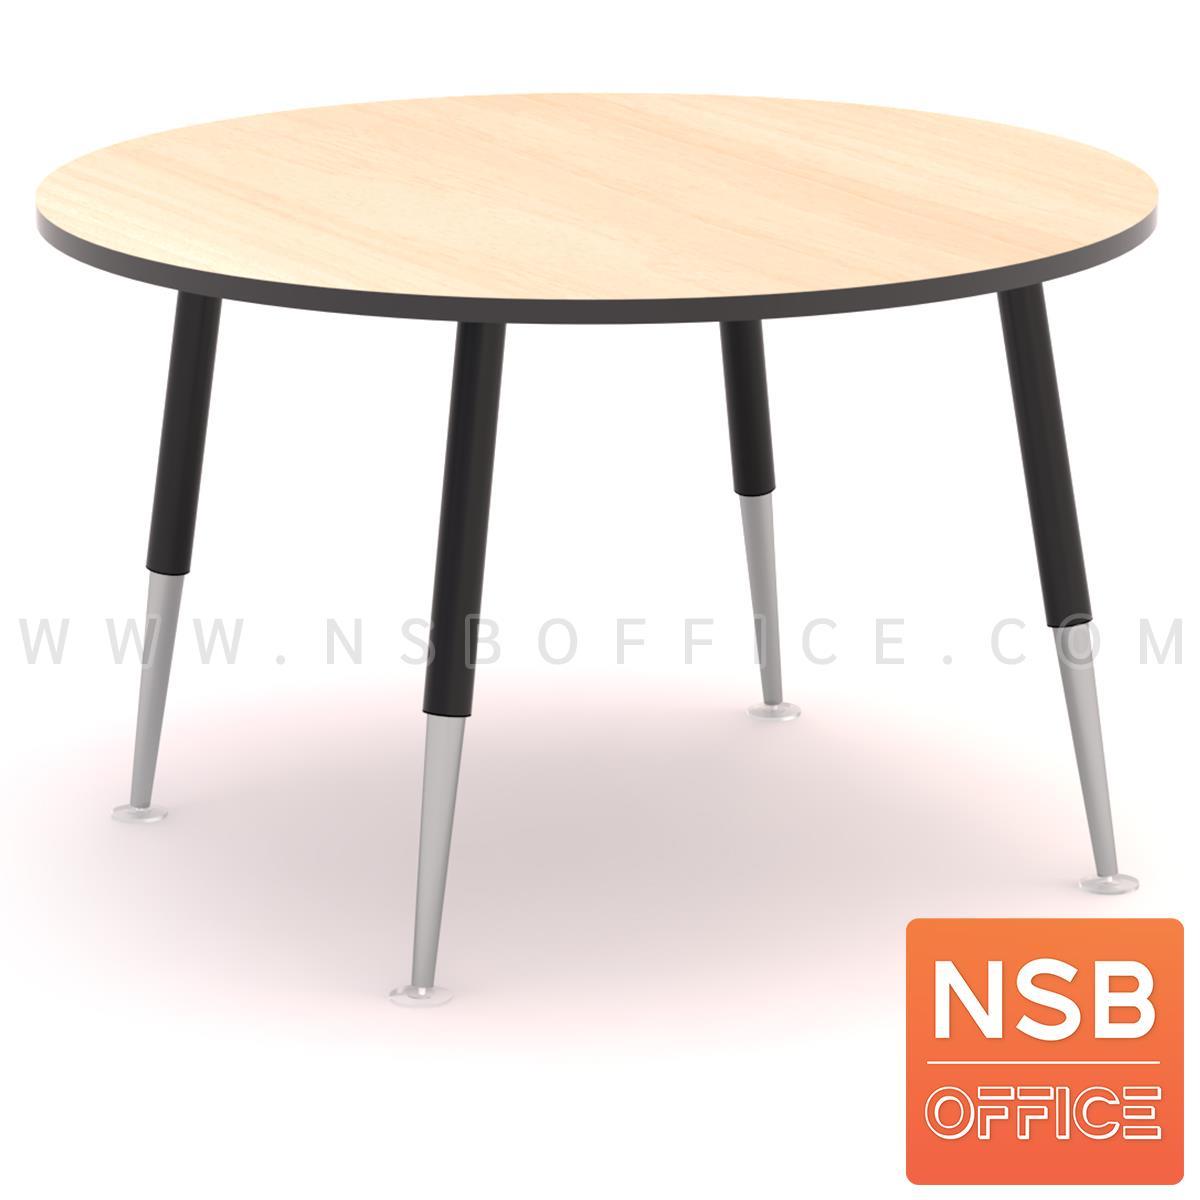 A05A227:โต๊ะประชุมทรงวงกลม รุ่น Wazowski (วาซอว์สกี้) ขนาด 90Di, 120Di cm. ขาเหล็กปลายเรียว